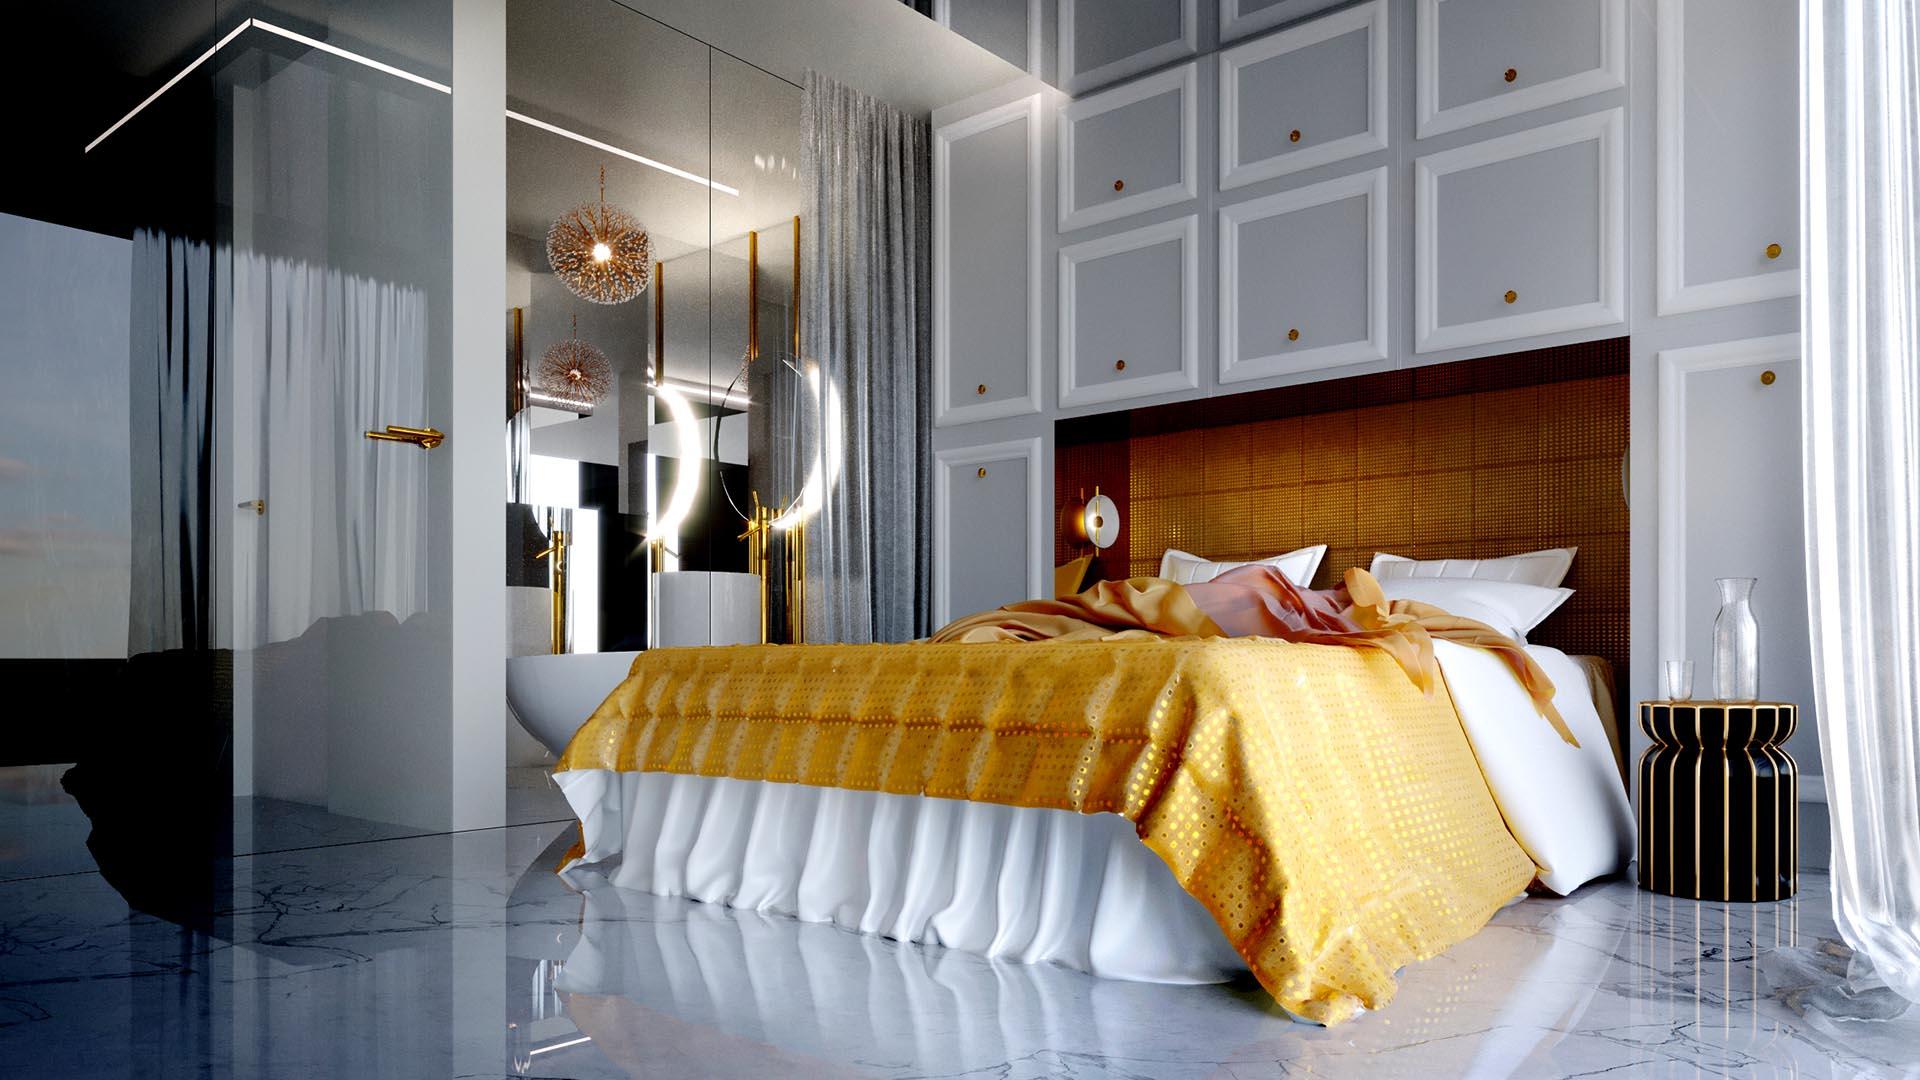 Apartament kometa - wizualizacja sypialni 2